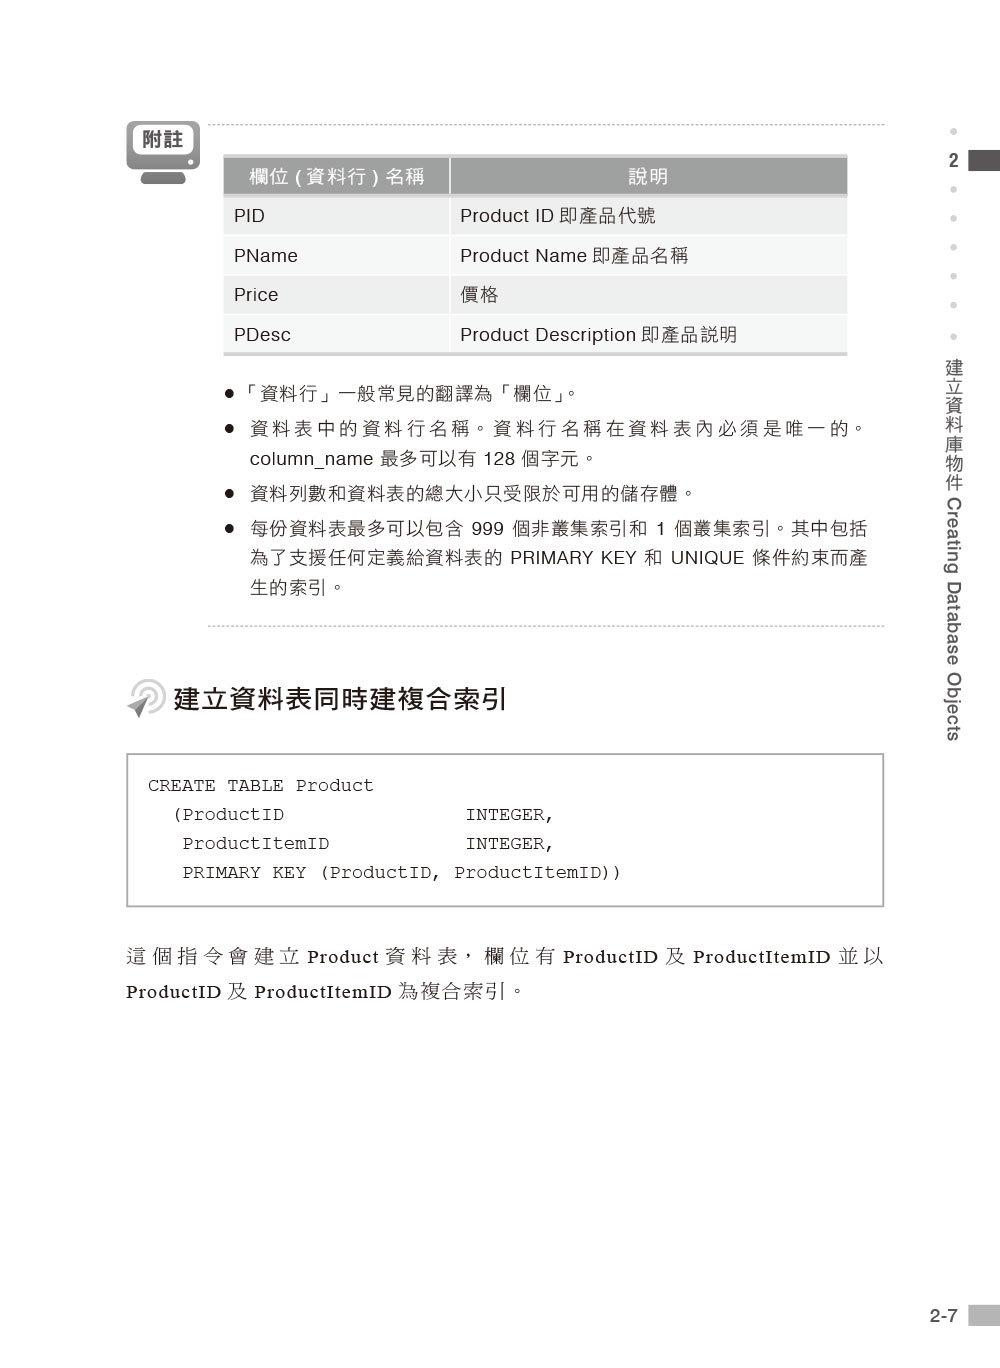 MTA Database Fundamentals 資料庫管理 國際認證教戰手冊 (98-364)-preview-9